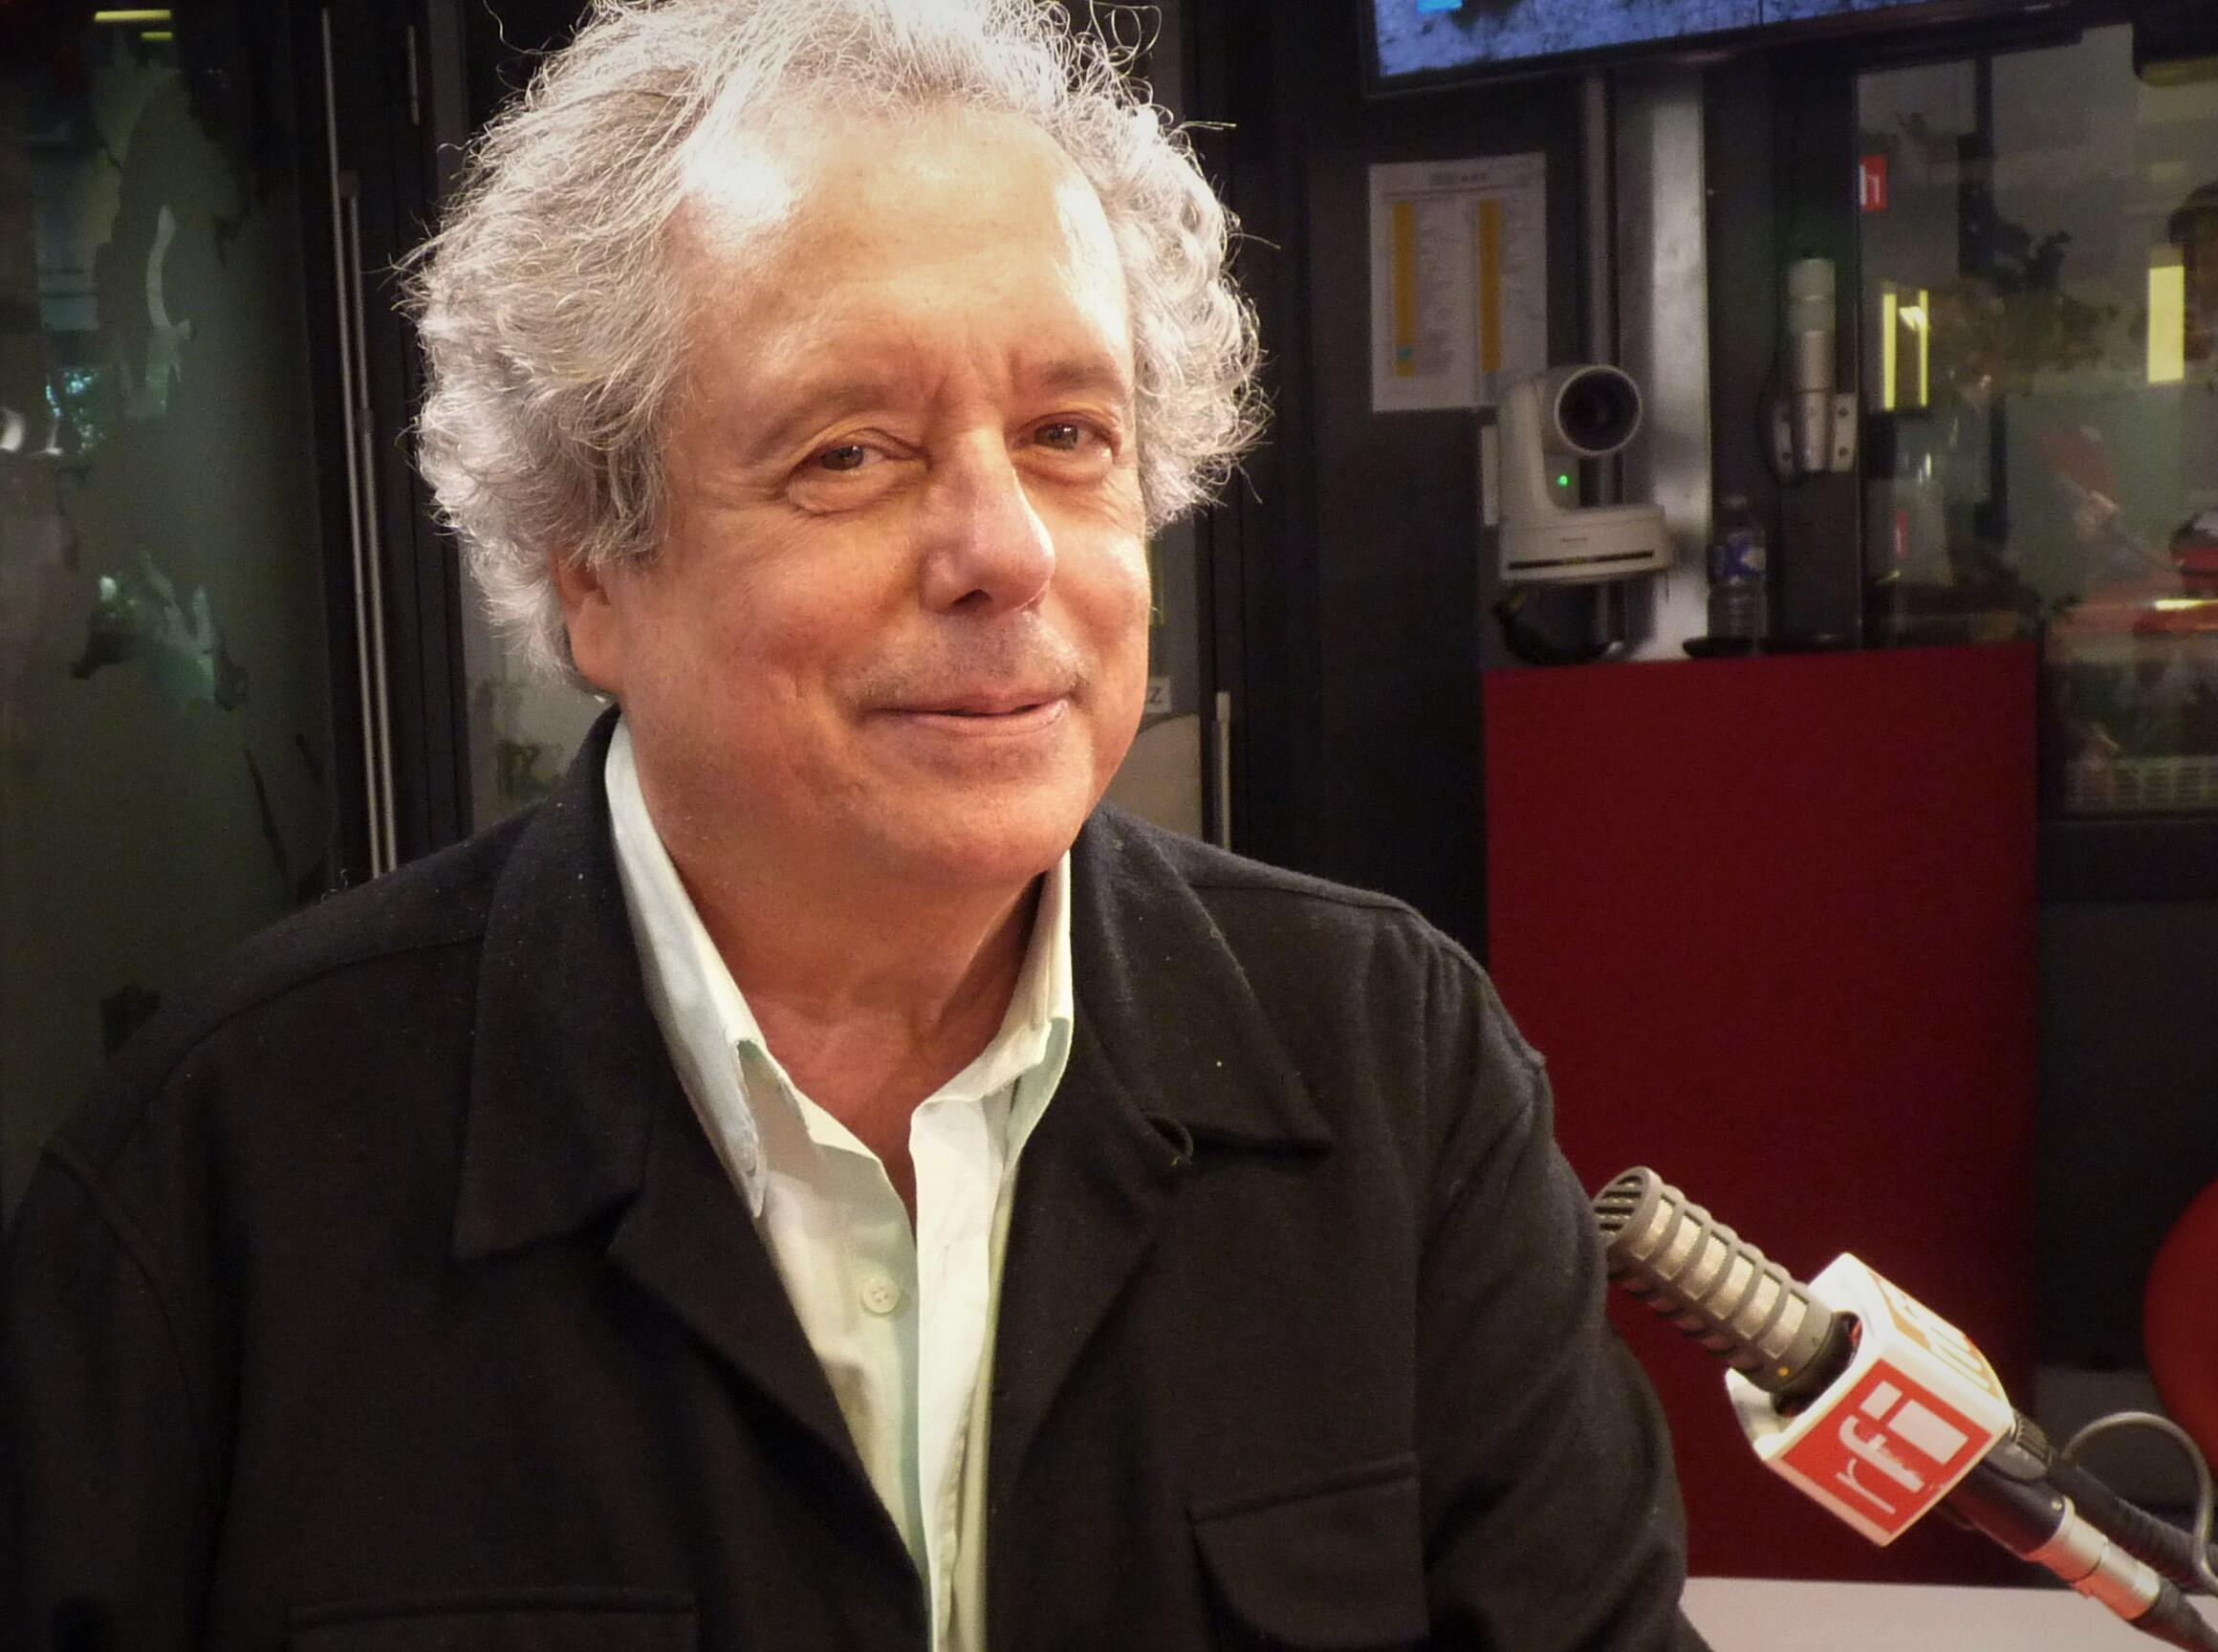 Camilo Racana, presidente del jurado del Festival AVIFF de Cannes en RFI